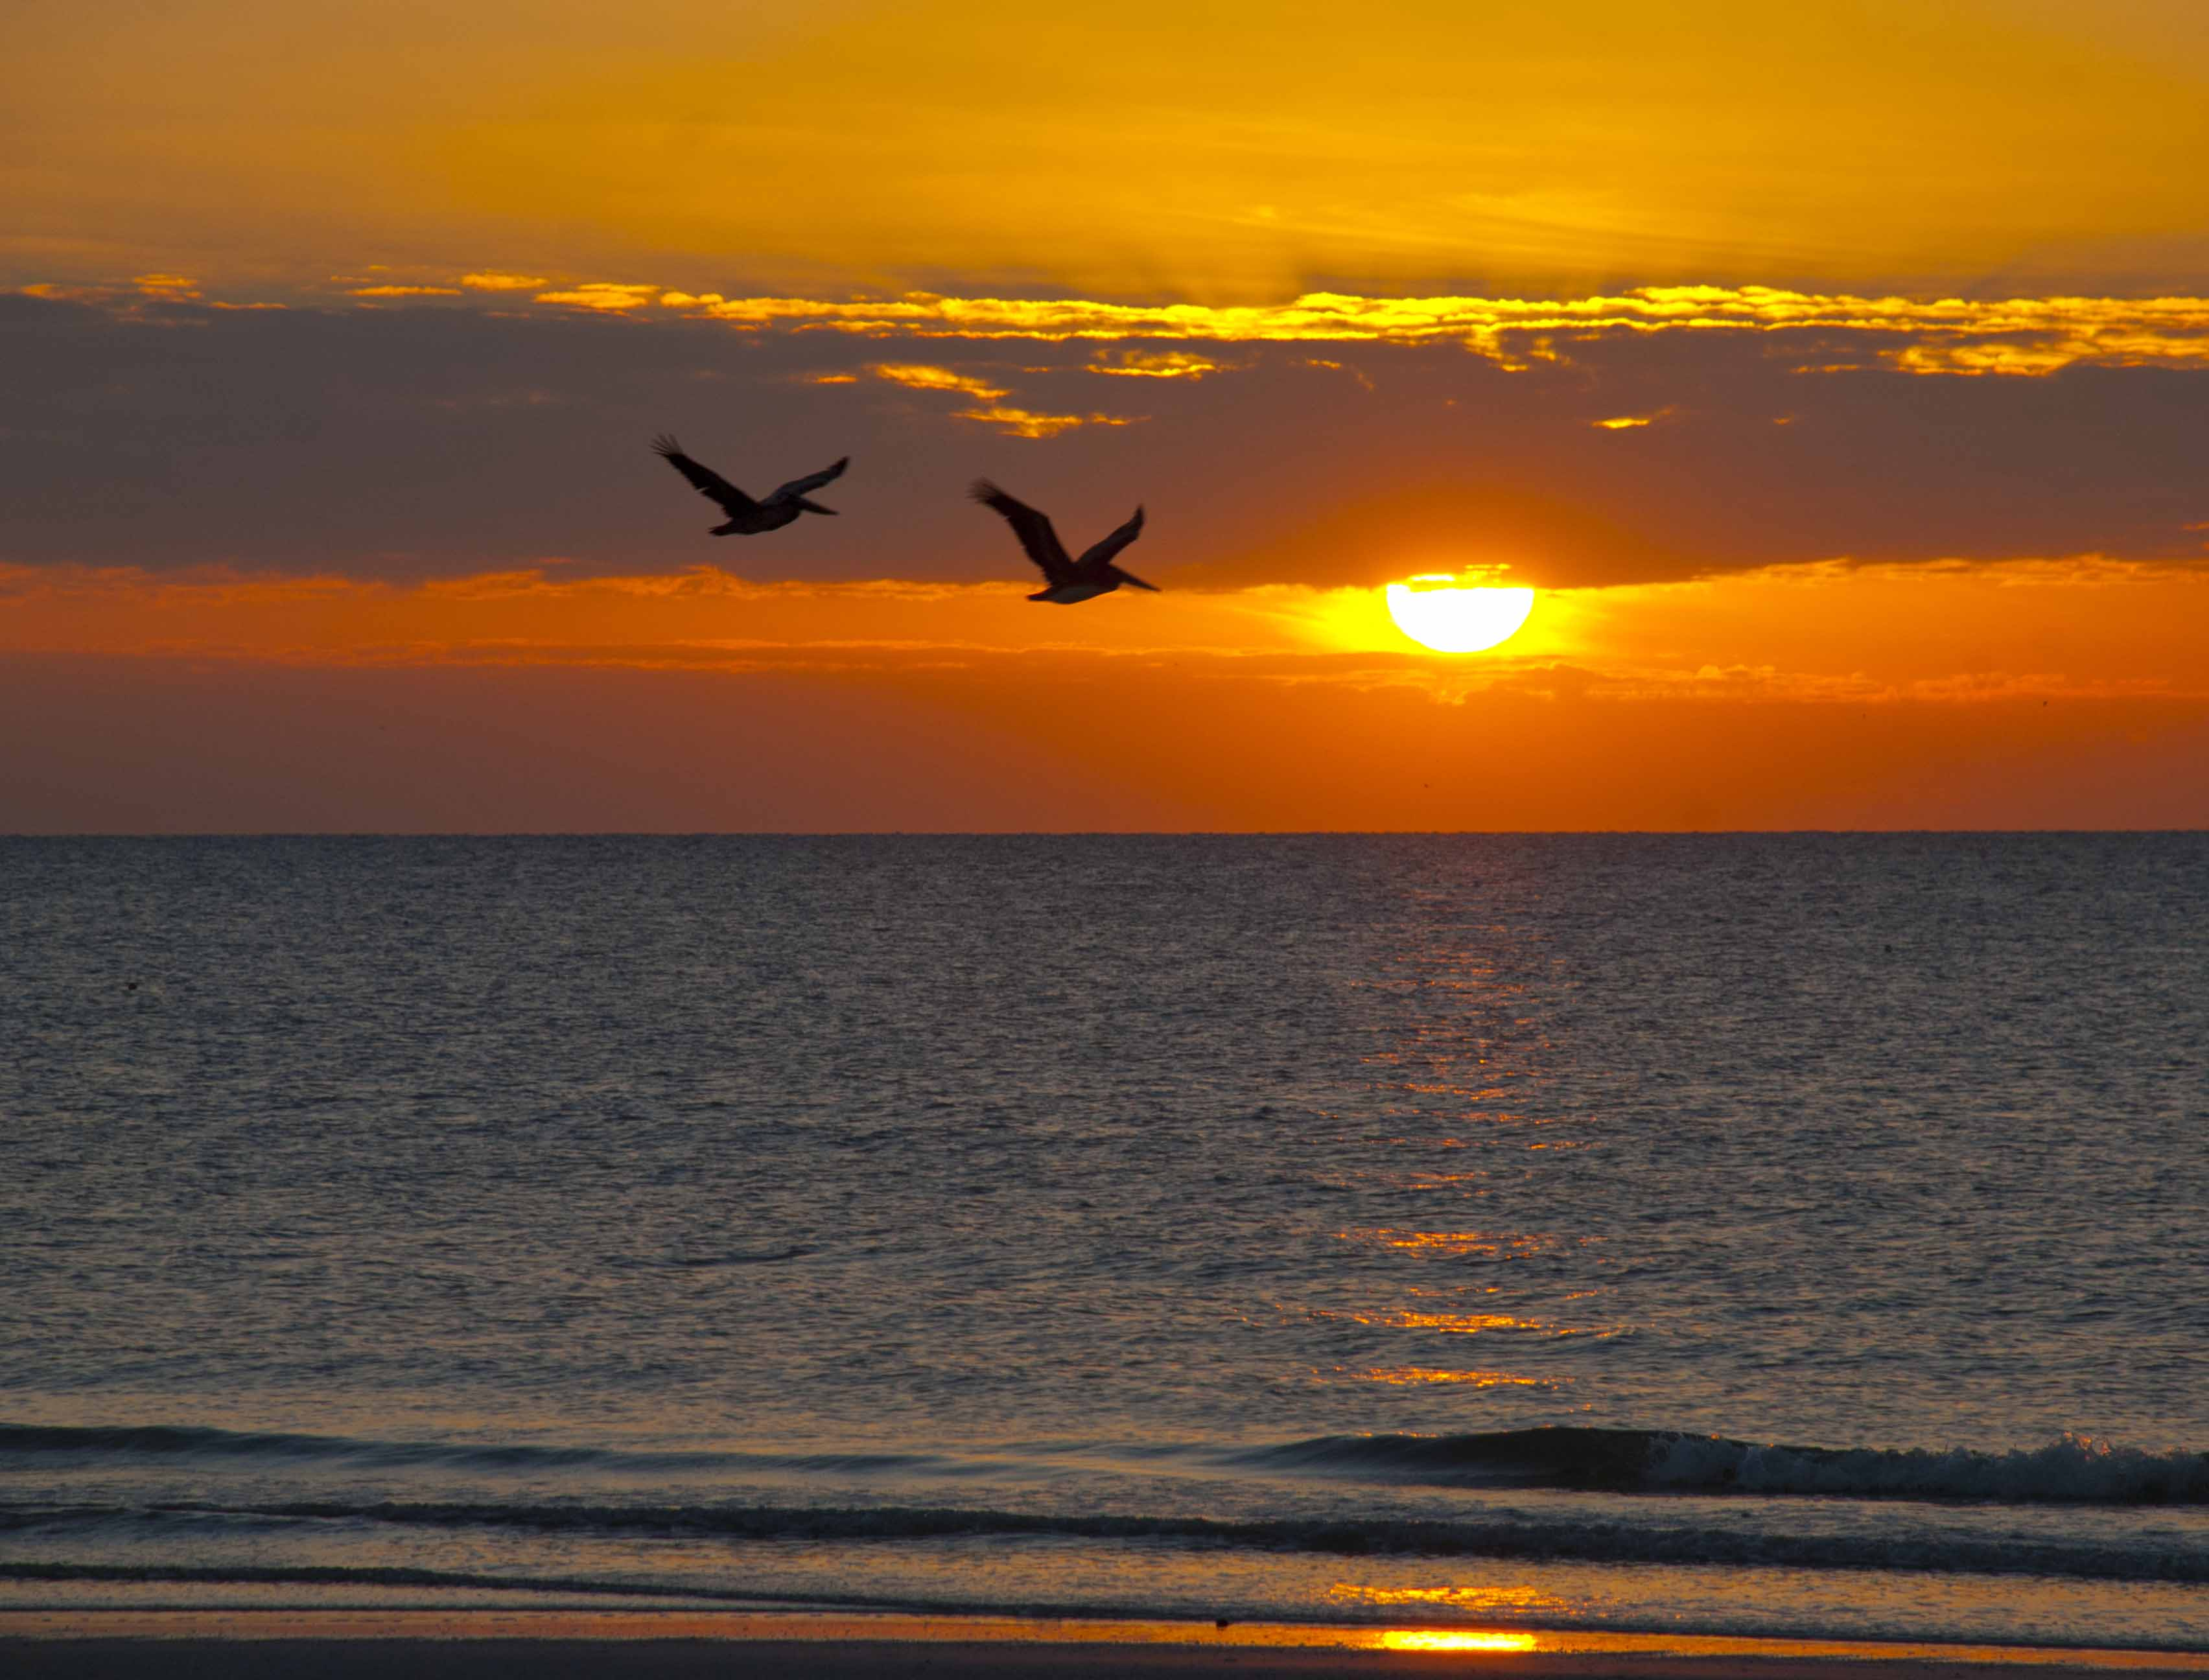 Sunset Time West Palm Beach